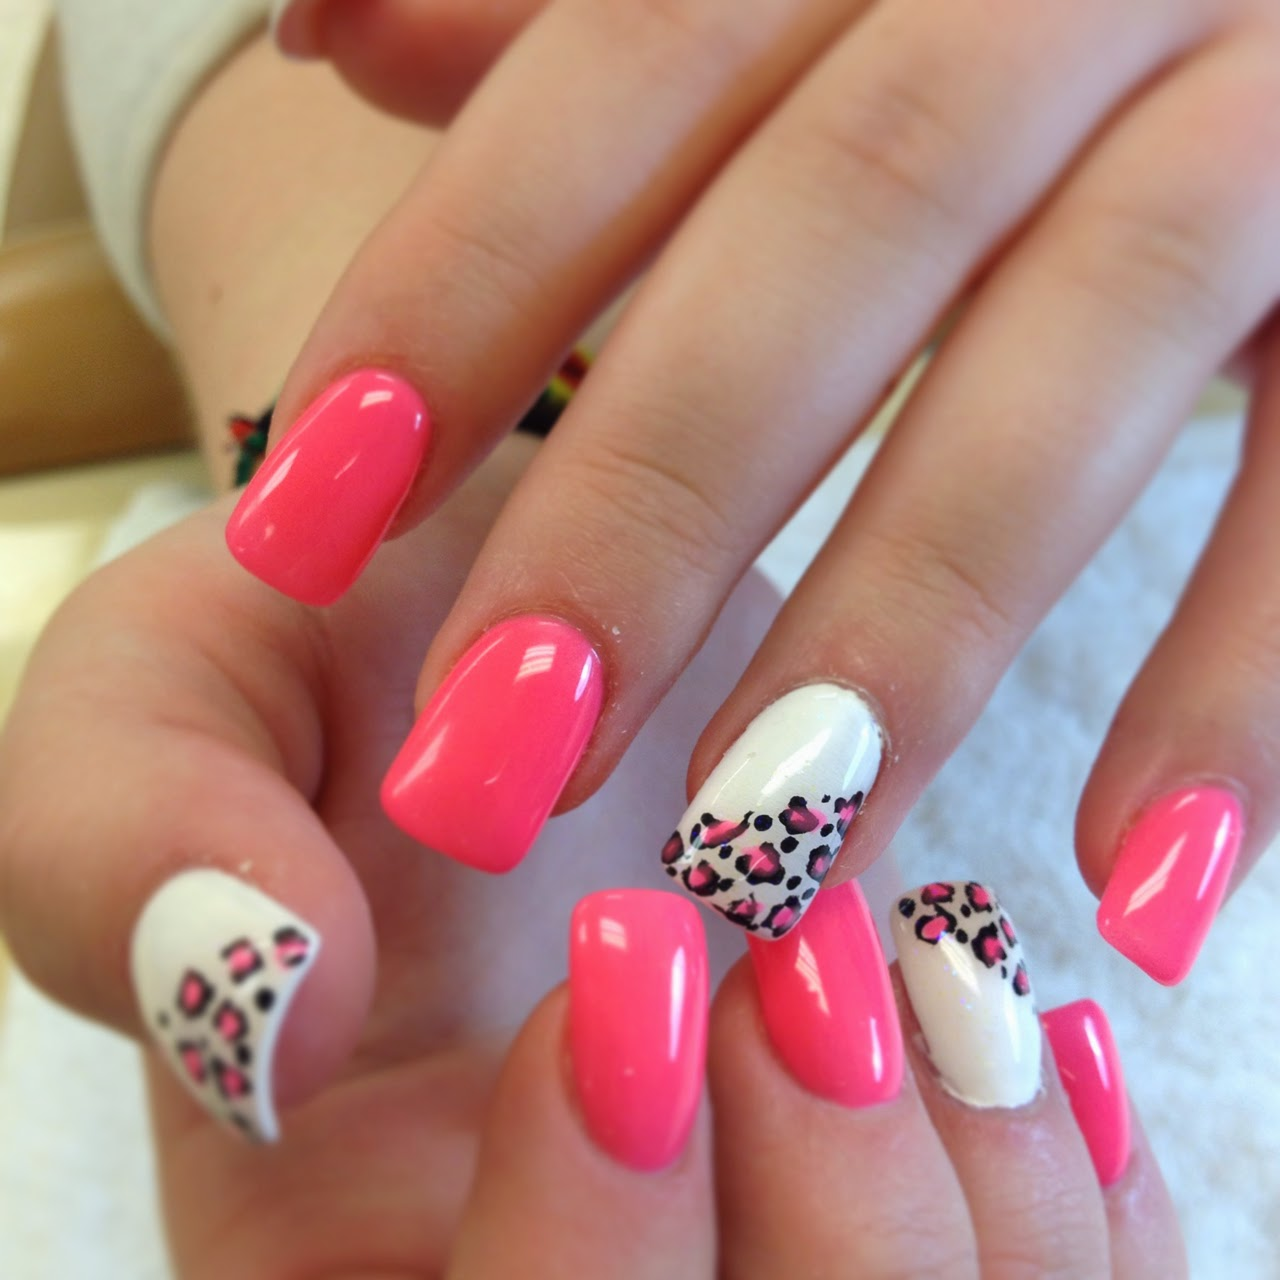 Nail salon designs: Nail Designs Simple & Easy salon spa